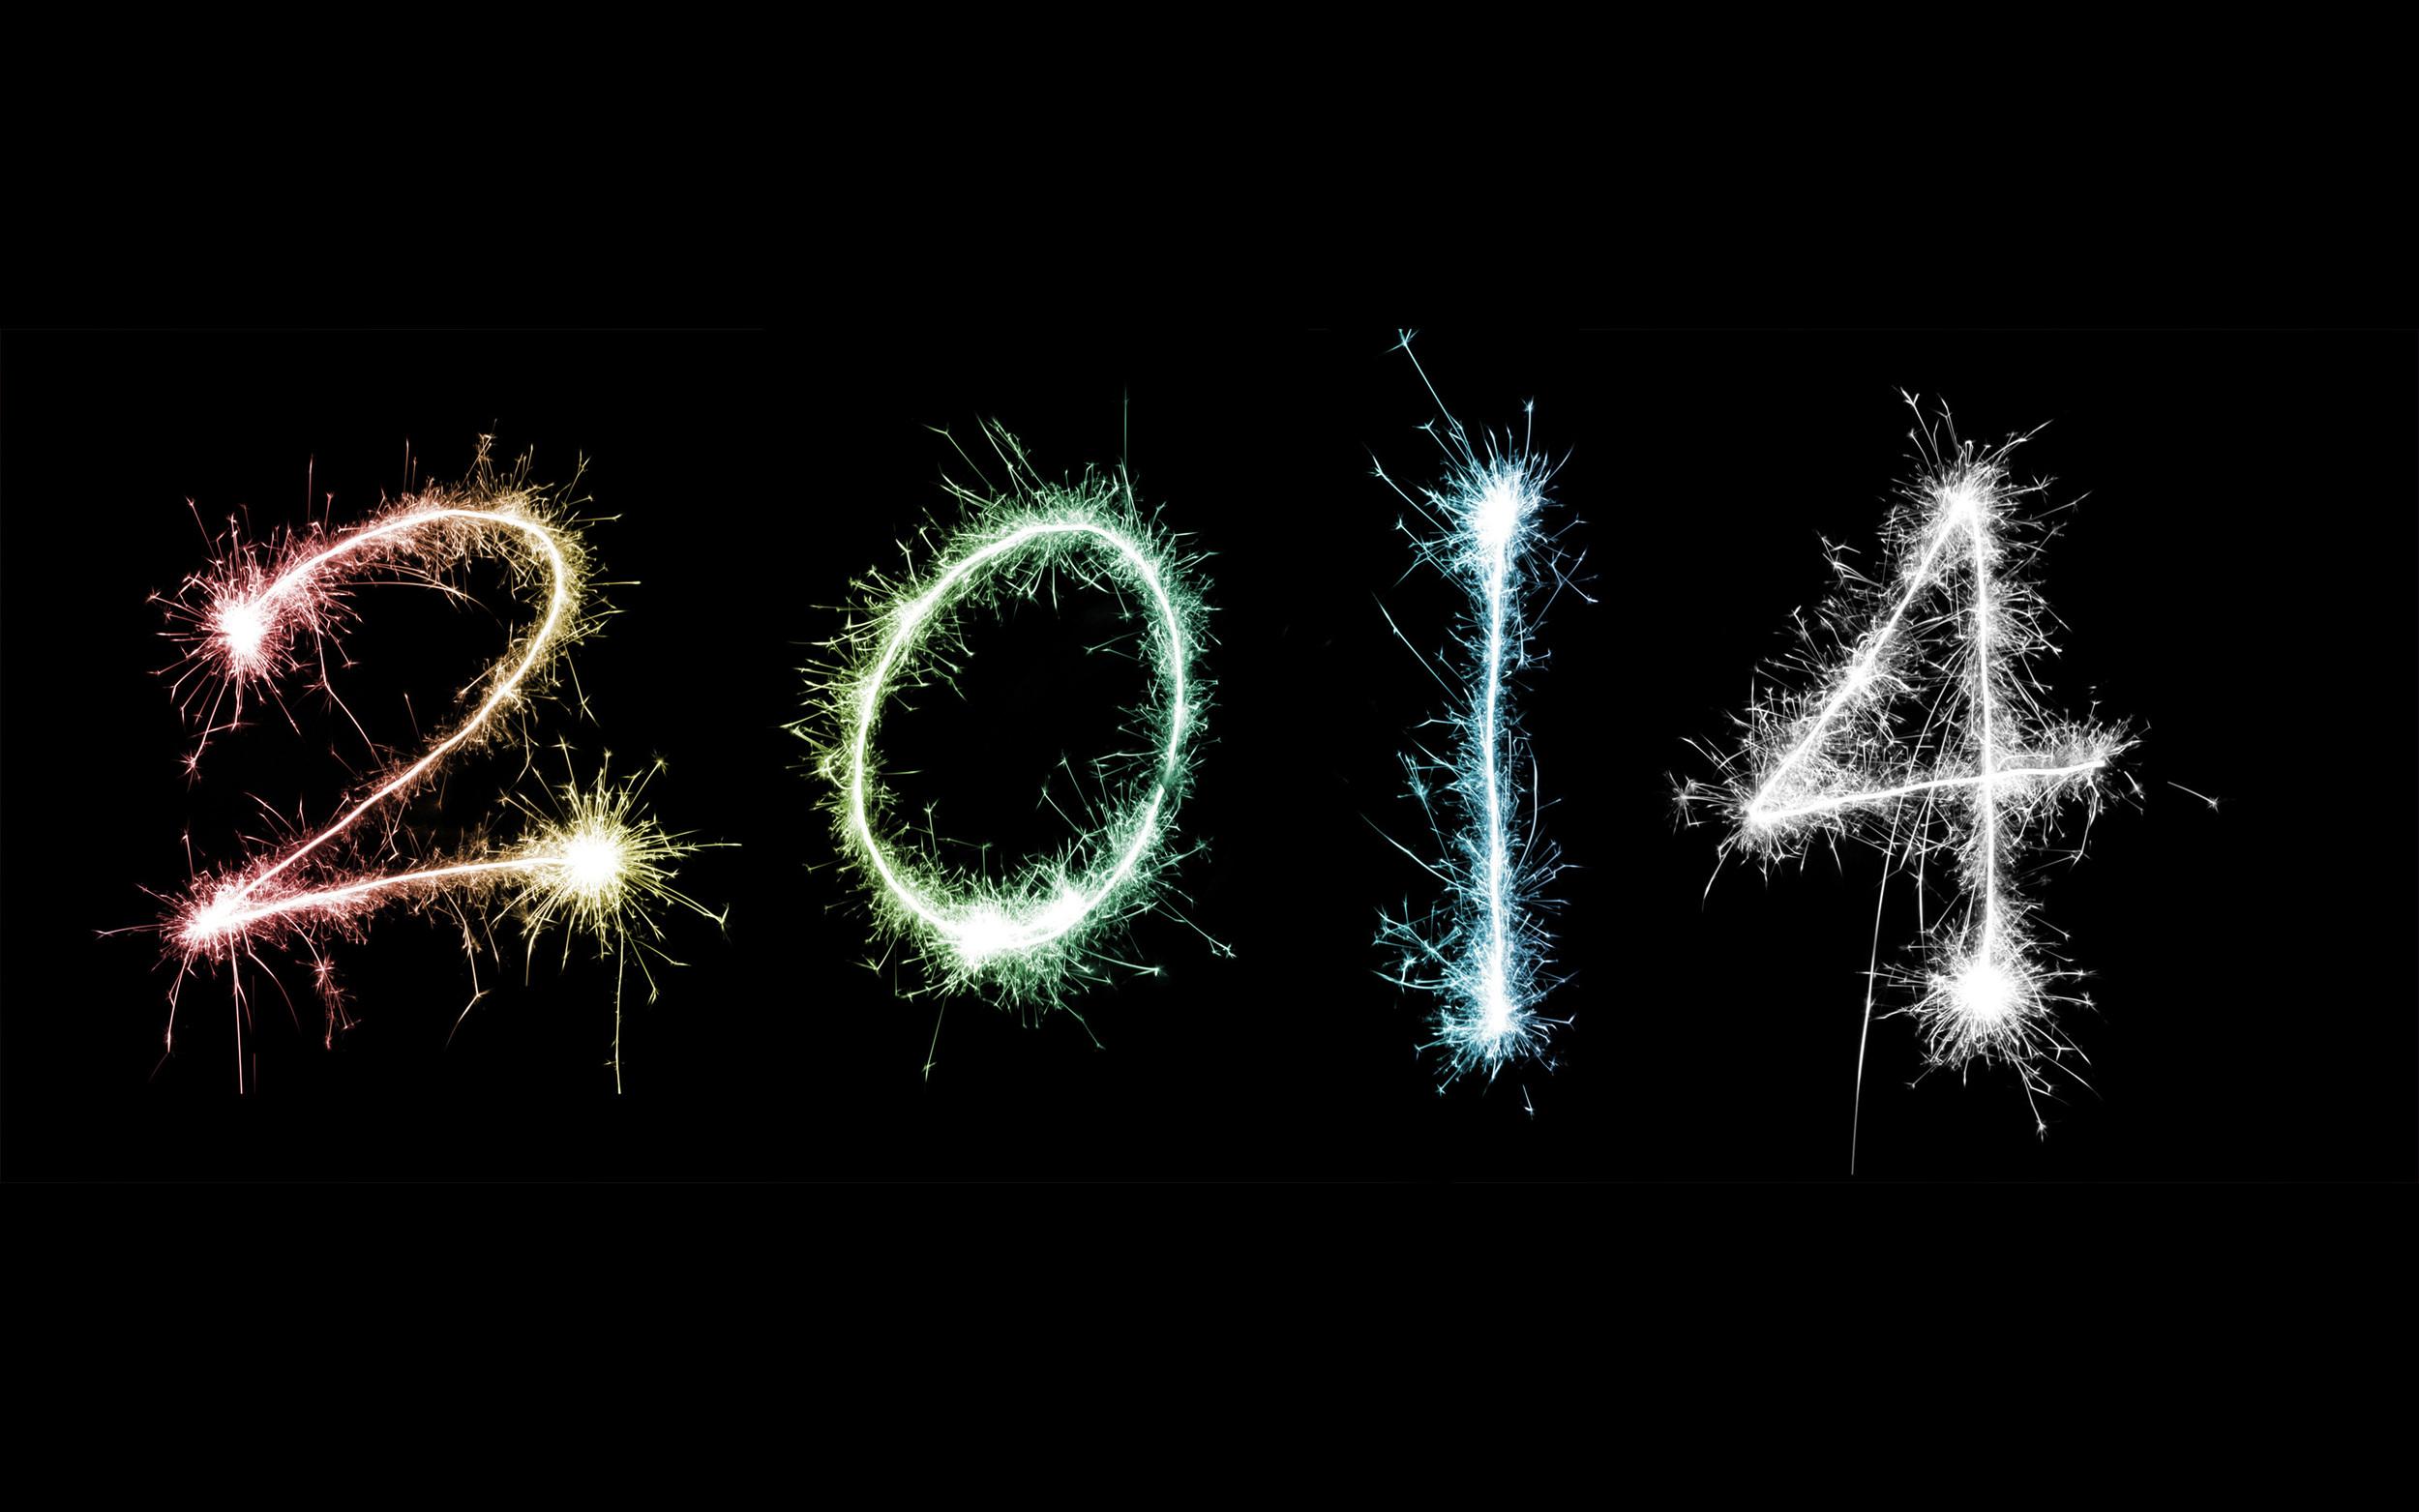 Happy-New-Year-2014-Wallpaper-Image-Pics.jpg